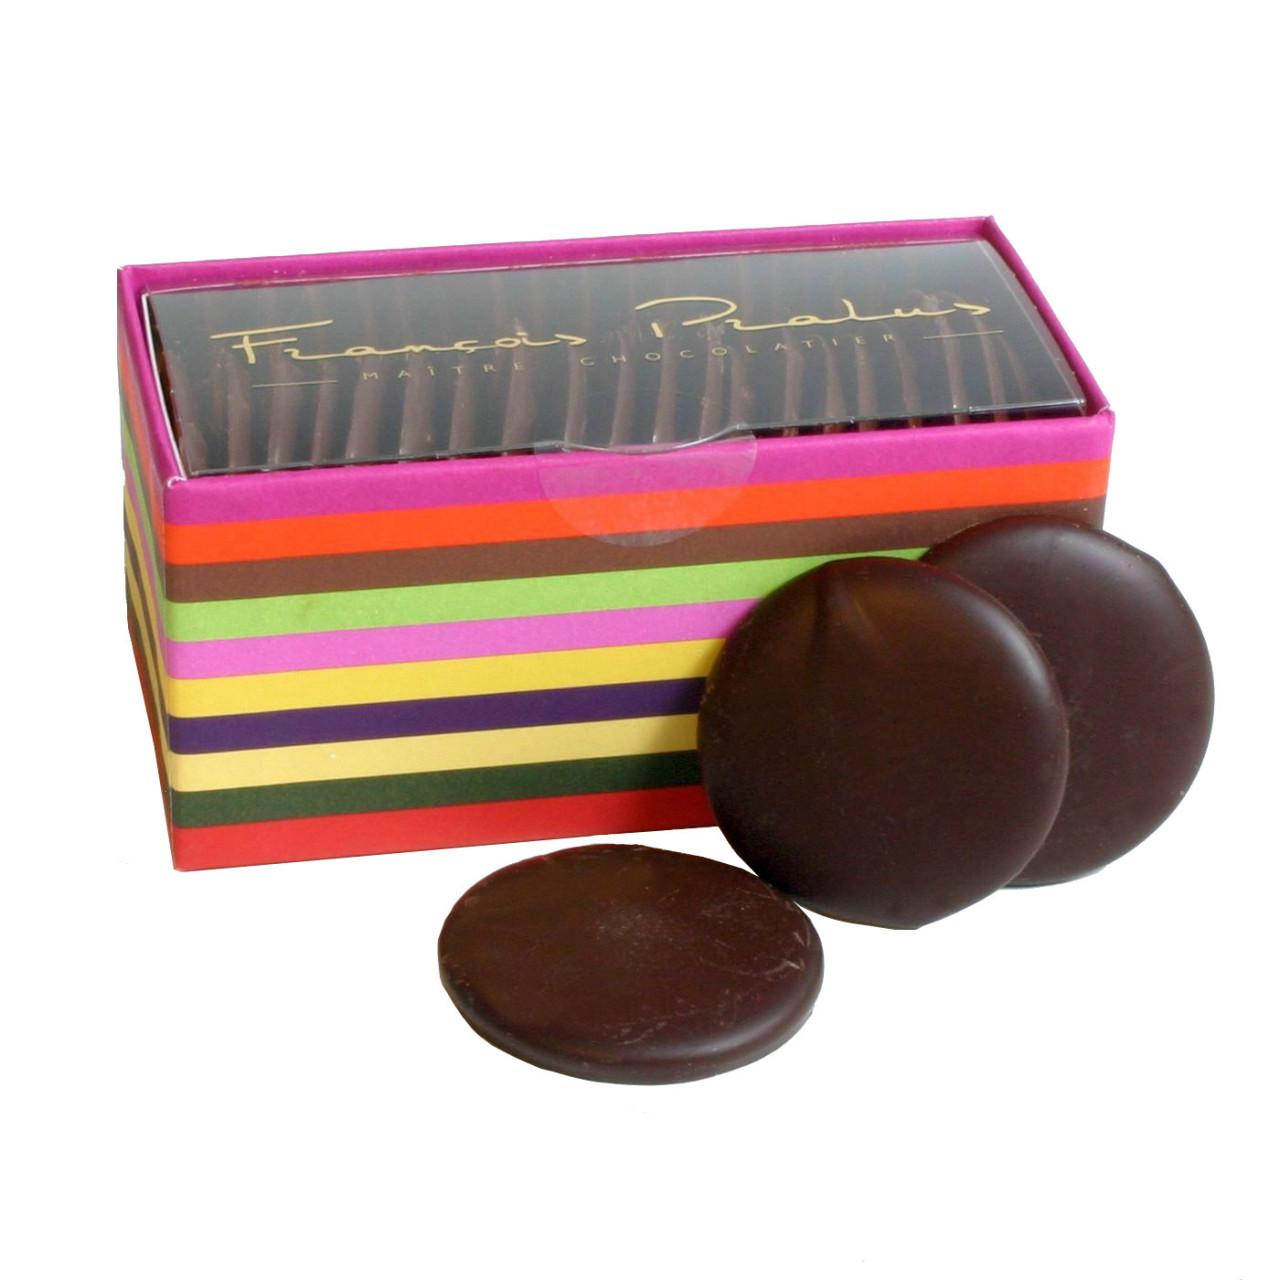 Dunkle Schokolade, Schokoladen Taler, chocolat noir, dark chocolate, Chuao, Venezuela, Herkunftsschokolade, Bean to Bar, 75%, Galets, Chocolate Buttons